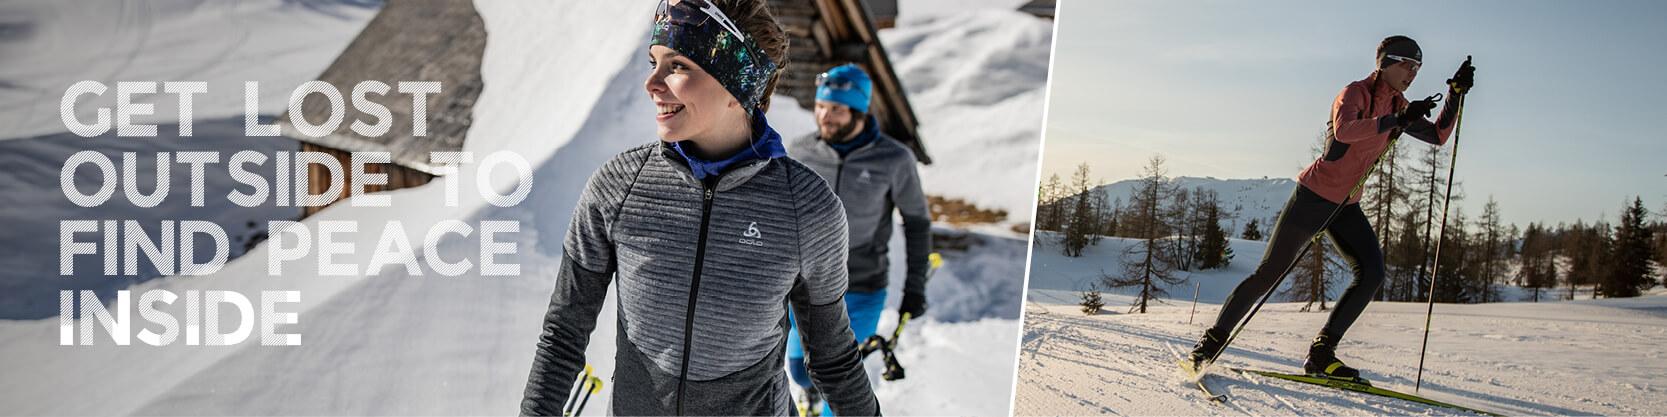 Odlo Women's Cross Country Skiing Category